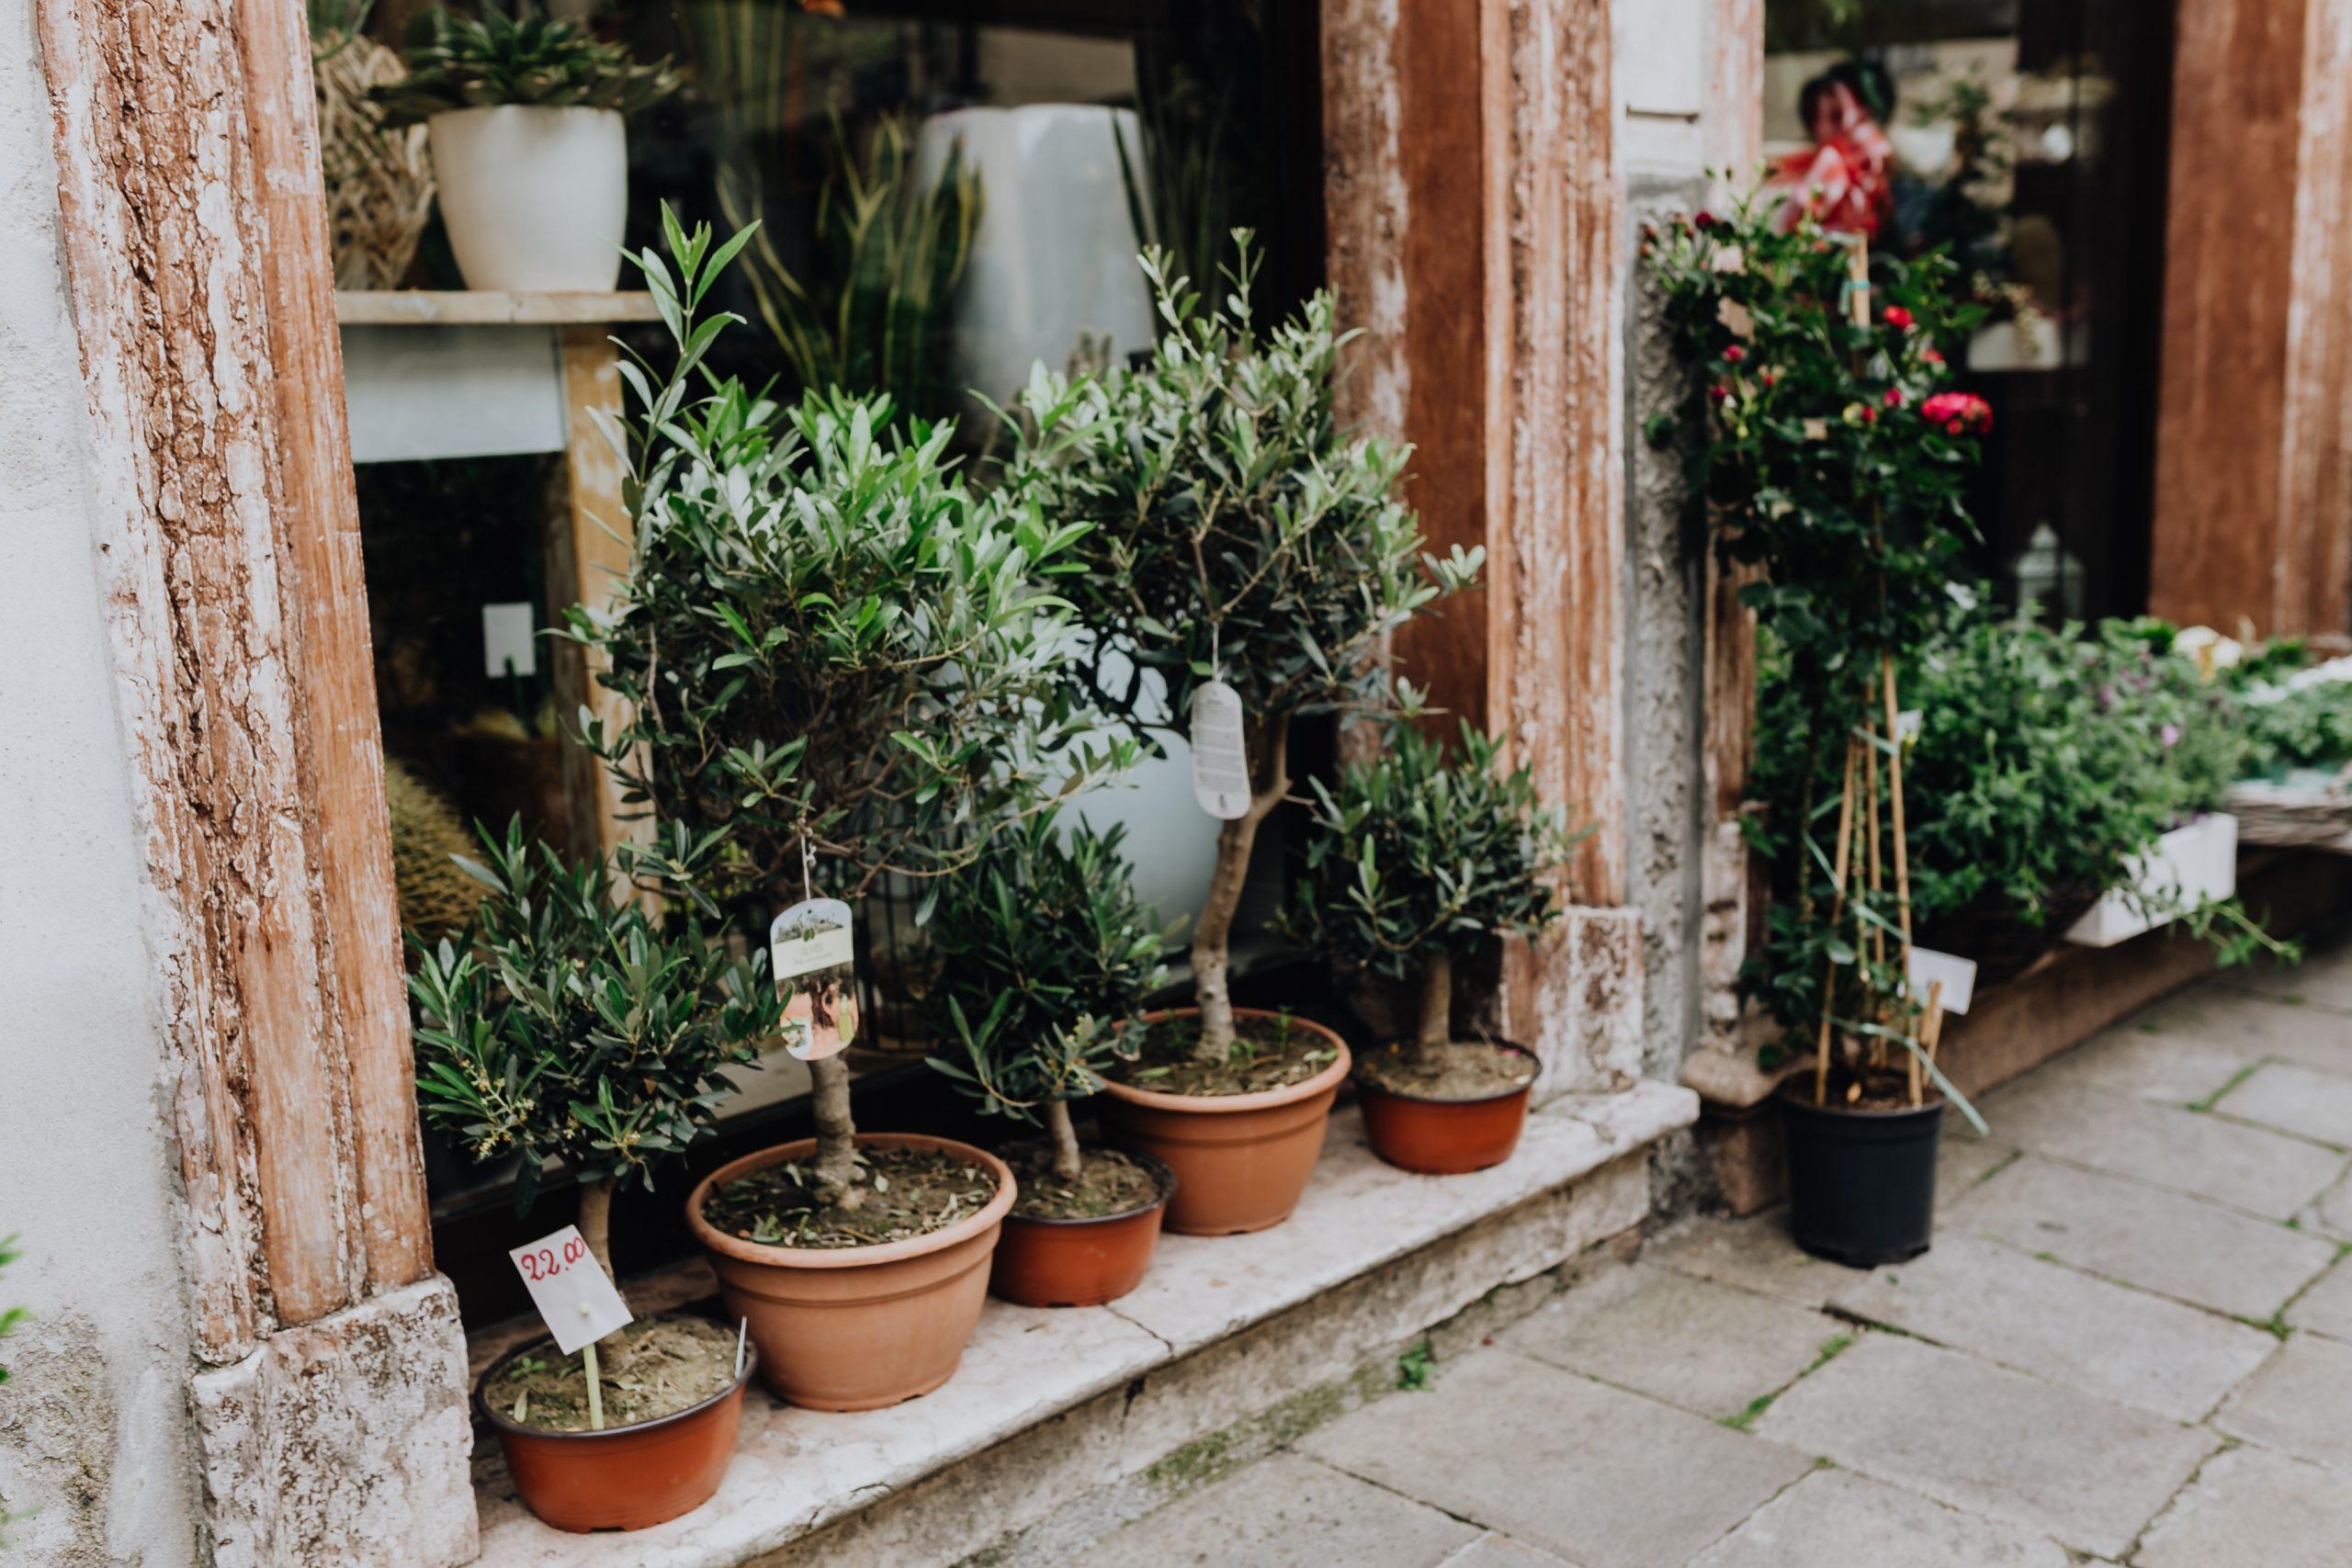 Der Olivenbaum – Pflege im Terracotta-Pflanztopf